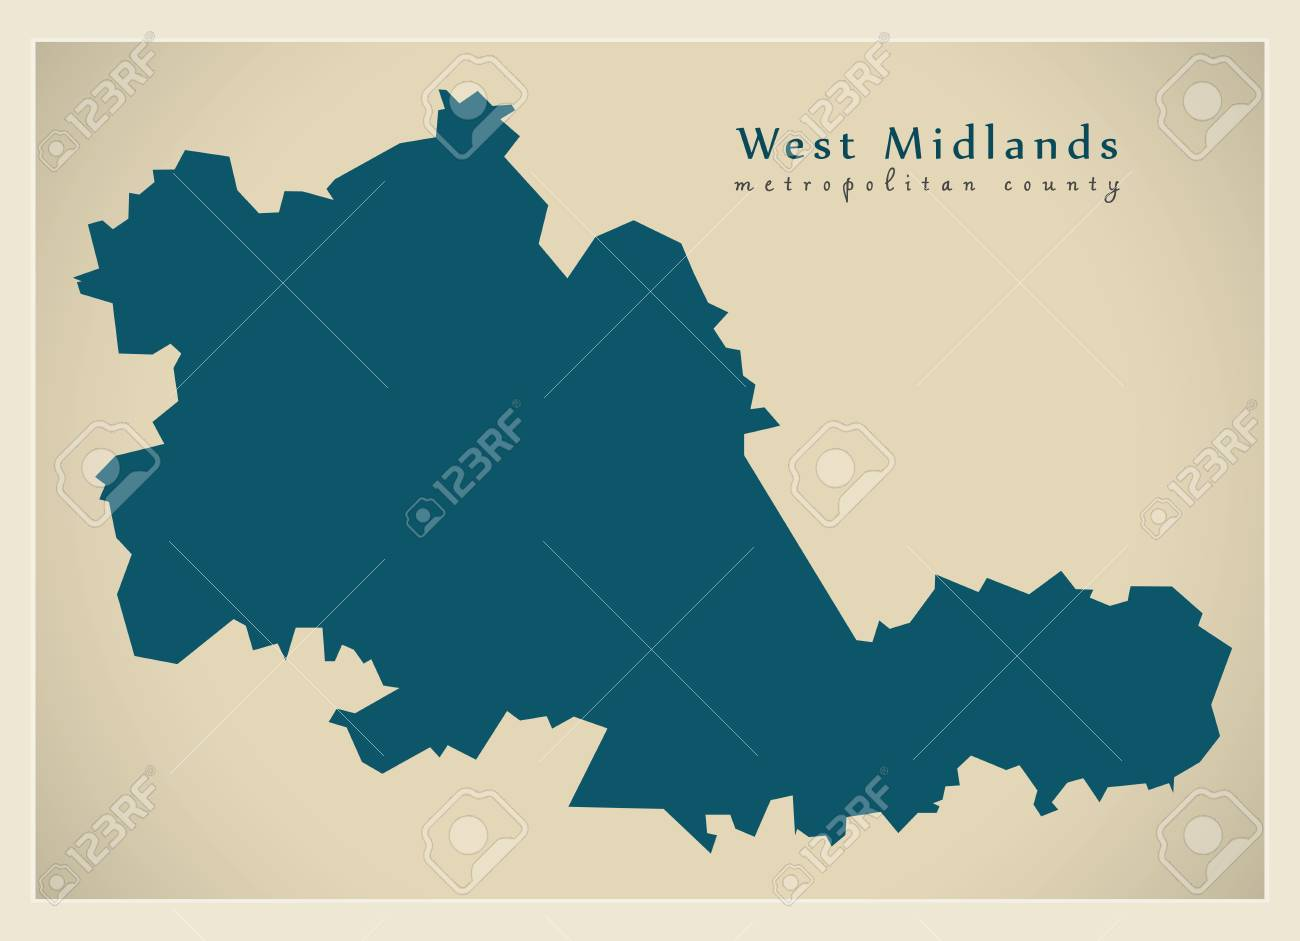 Modern Map West Midlands Metropolitan County England Uk Royalty